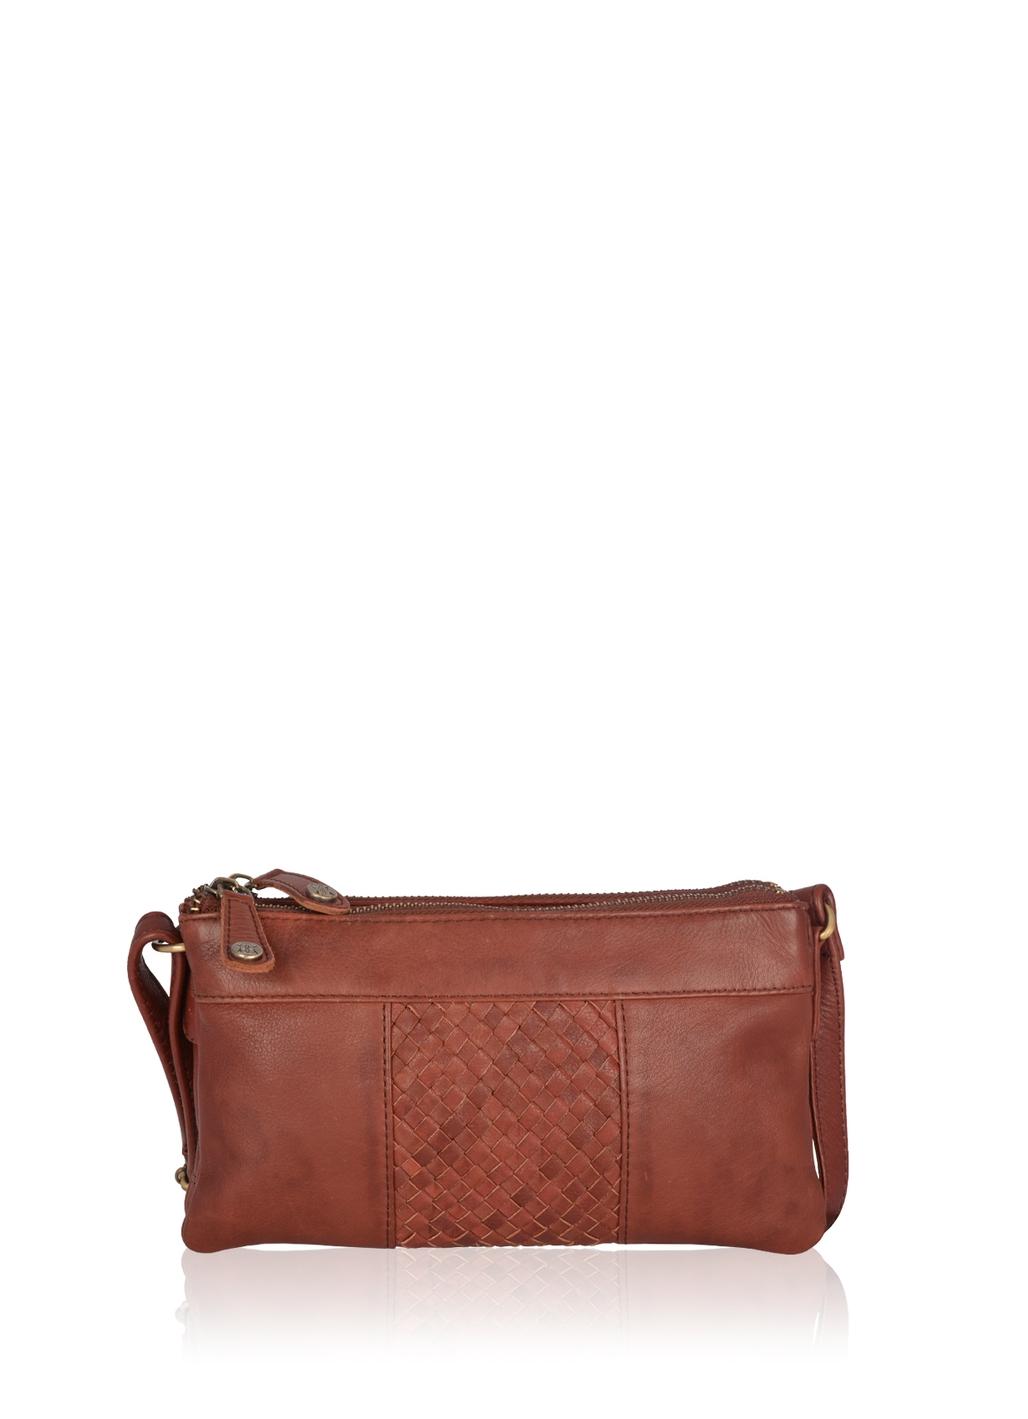 Gosforth Leather Cross Body Bag in Burgundy